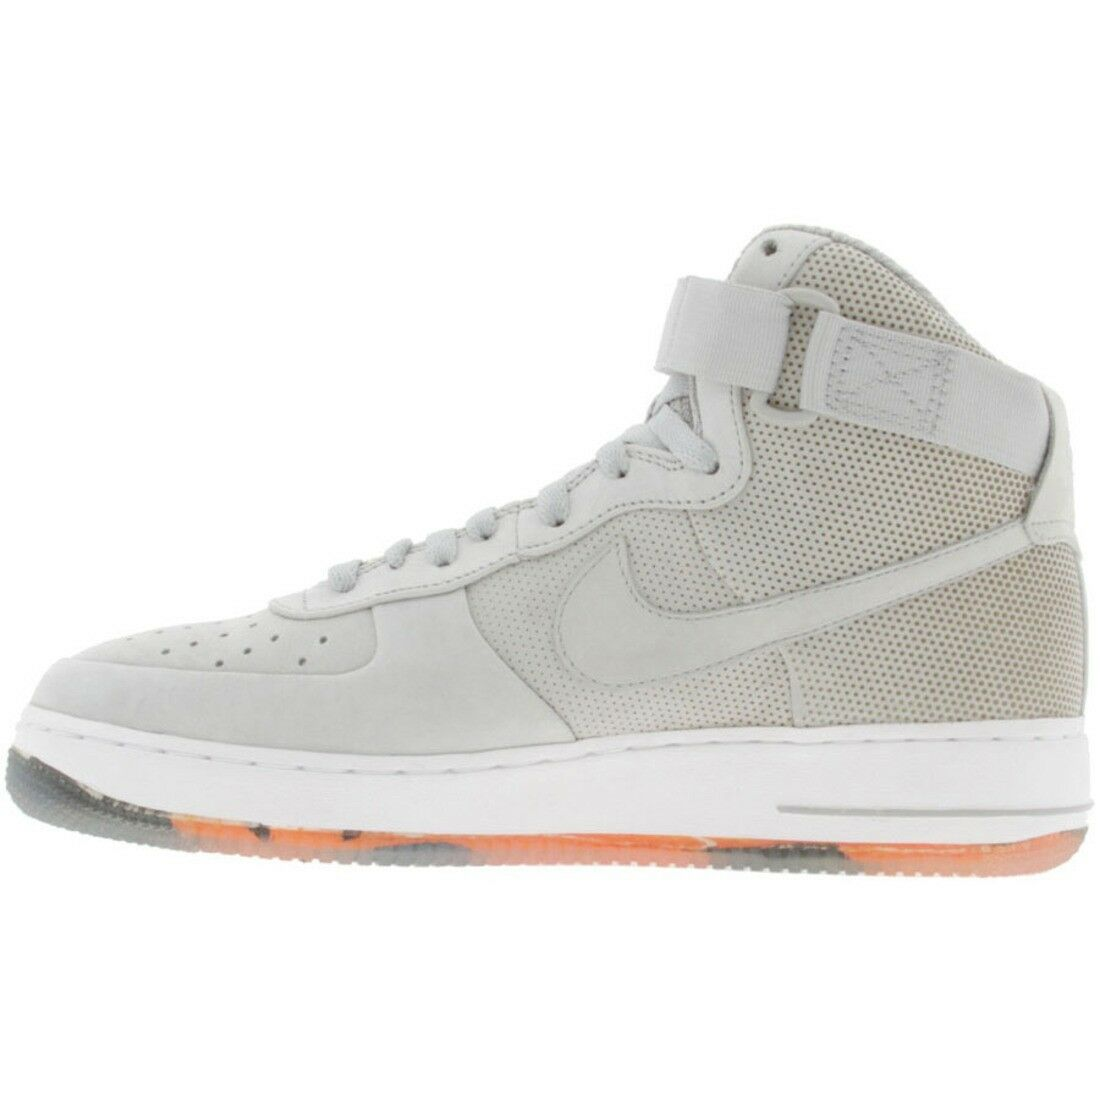 345189-001 Nike Air Force 1 High Supreme - Futura Matte Silver orange